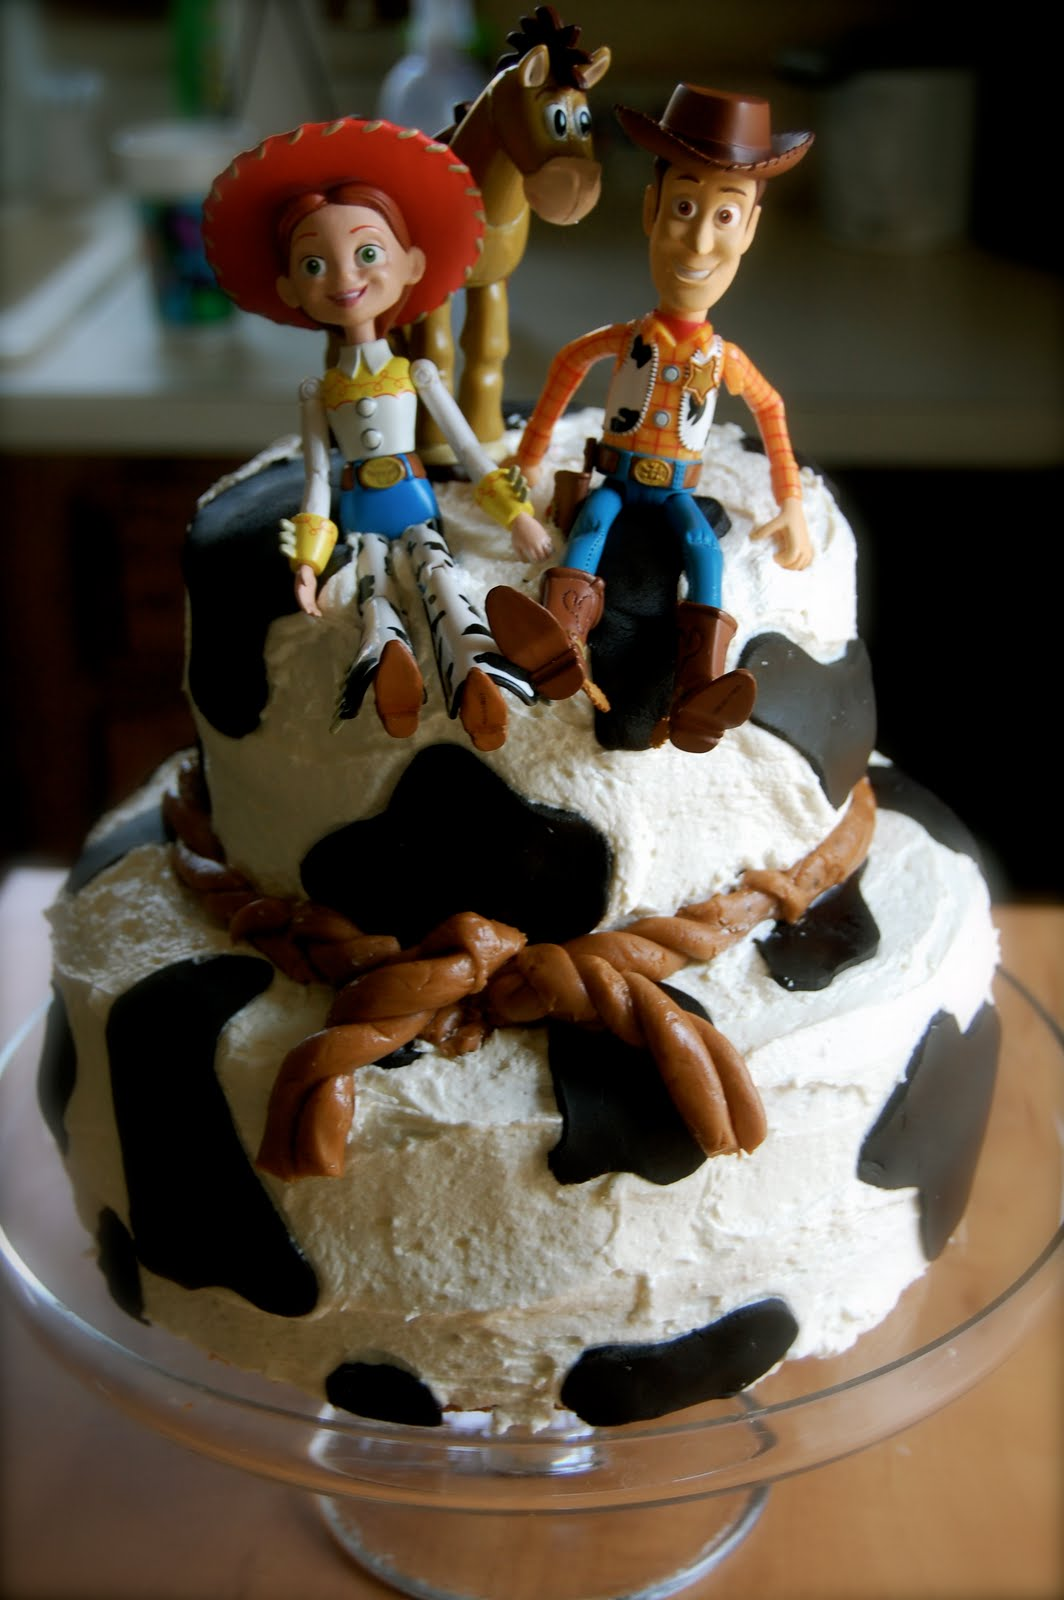 Kara S Party Ideas Toy Story Birthday Party Jessie And